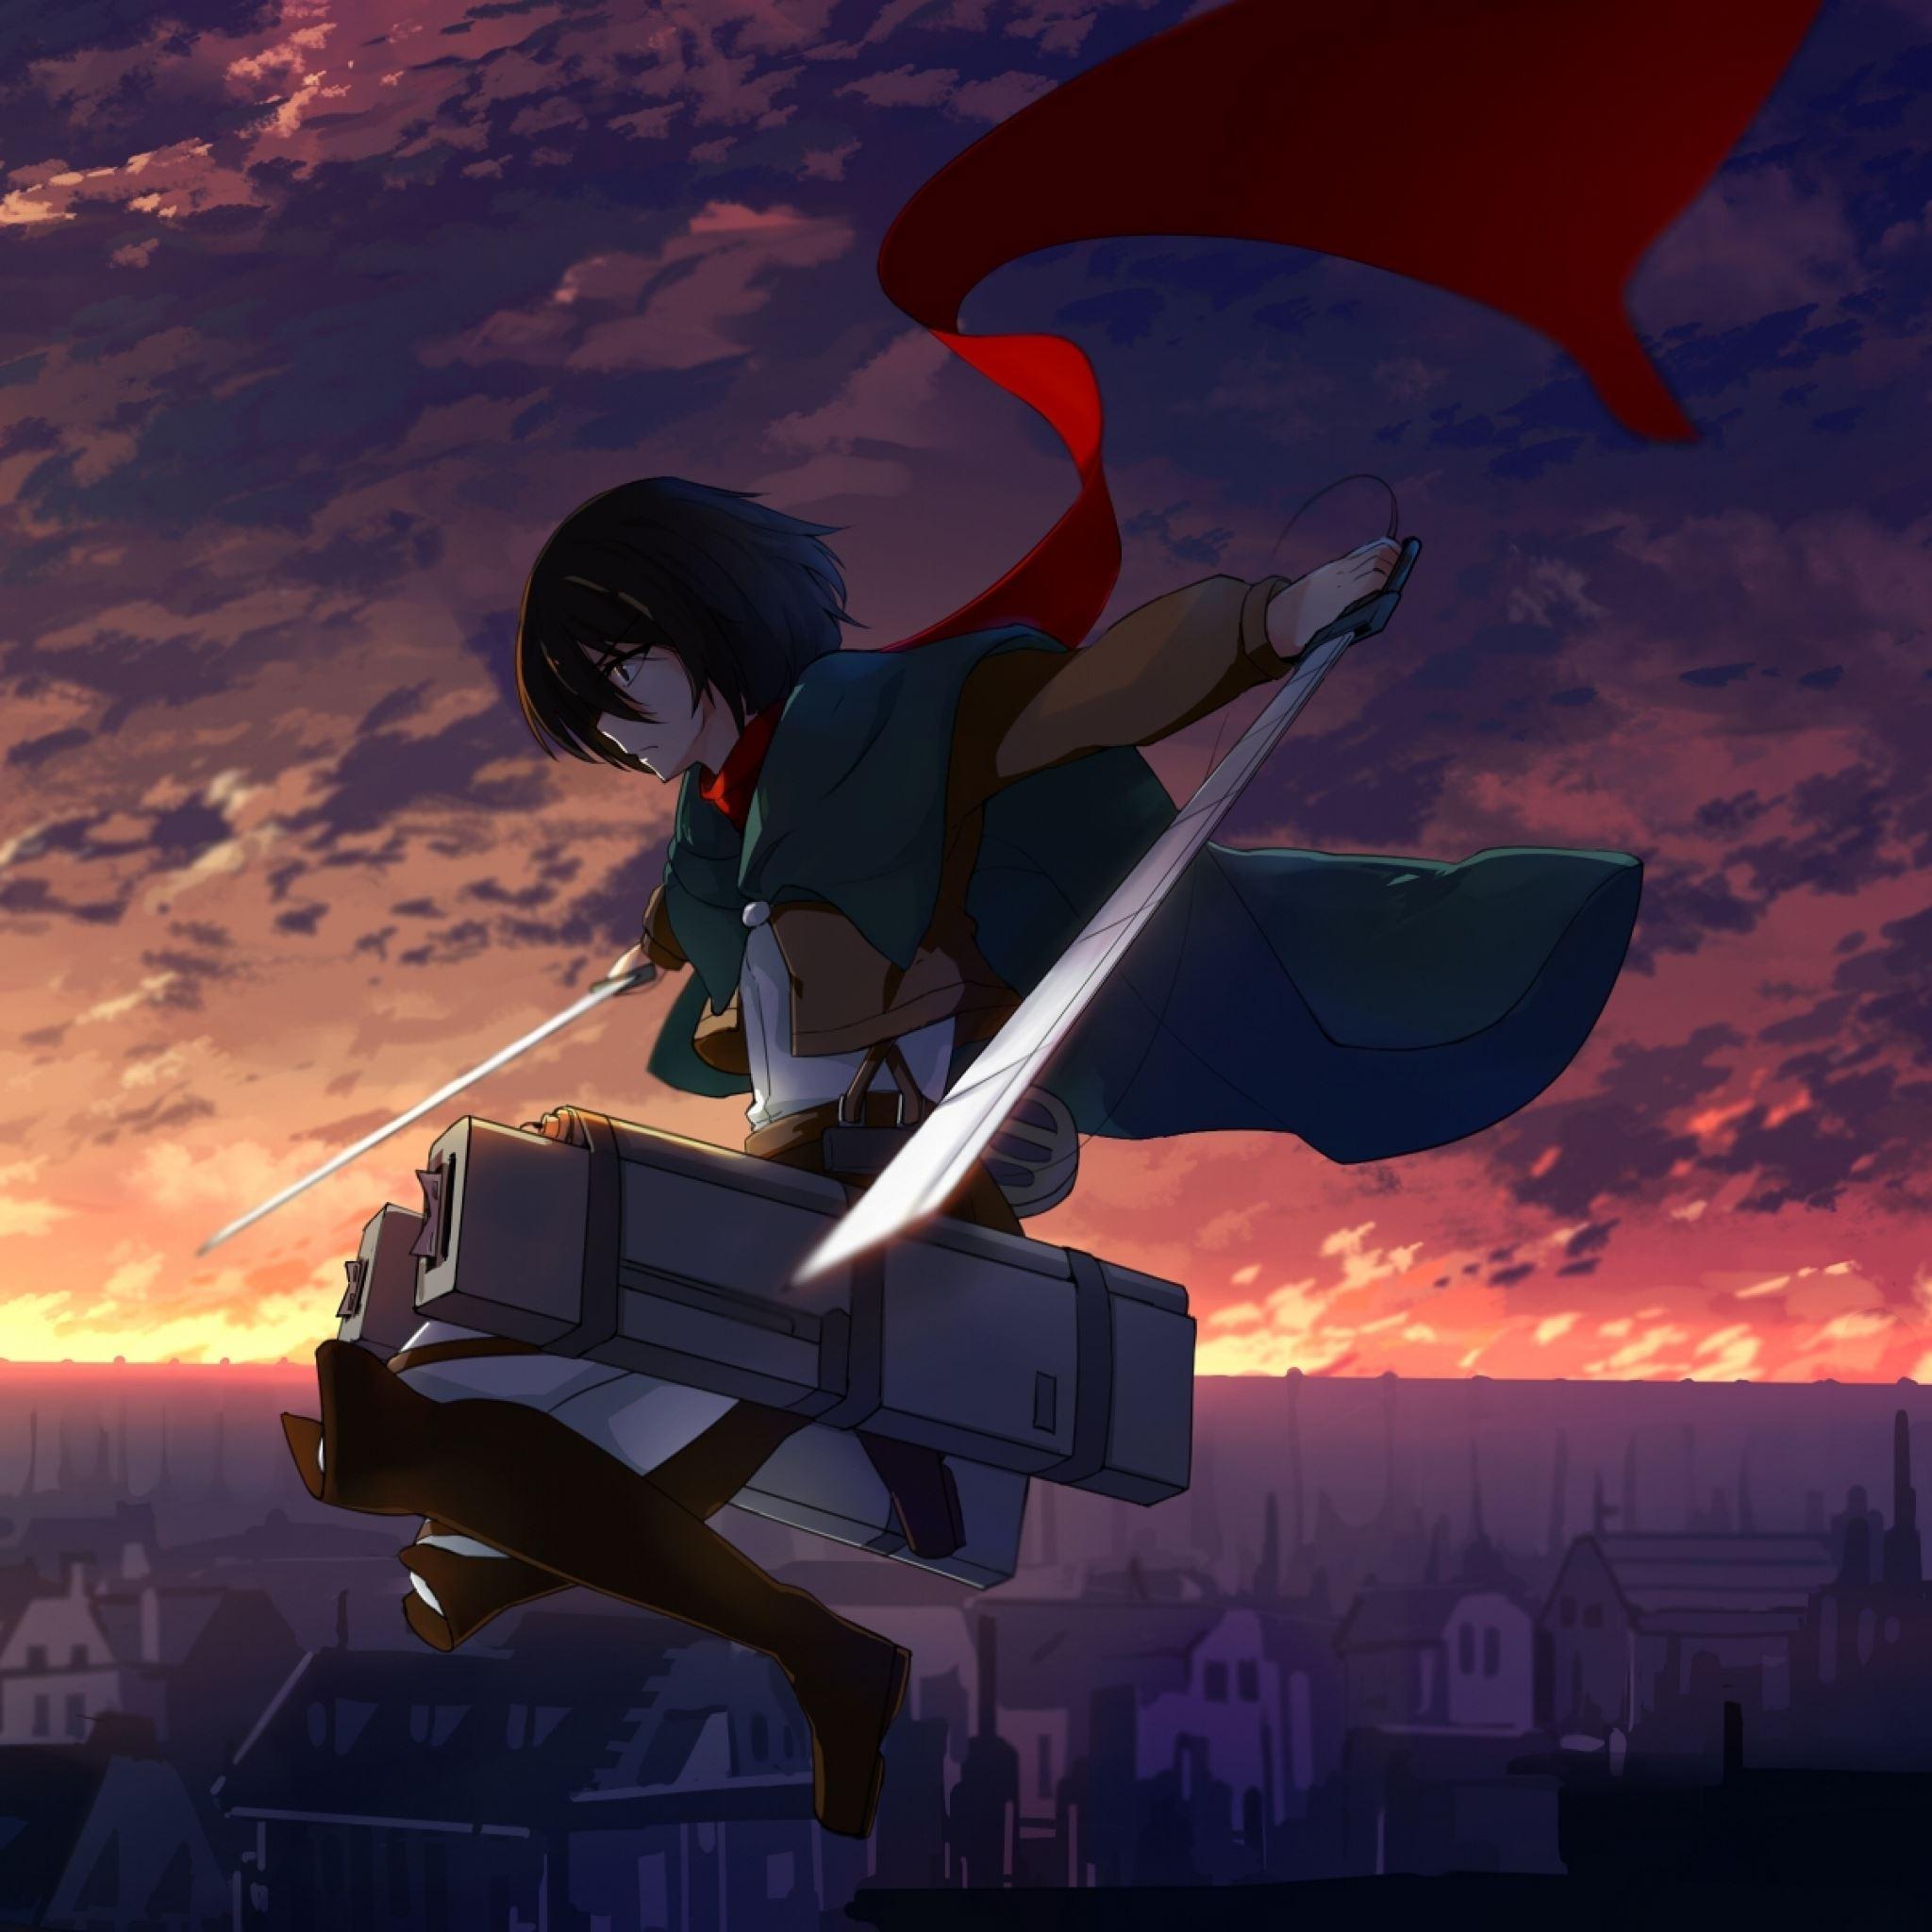 Best Anime Cartoons Ipad Air Wallpapers Free Hd